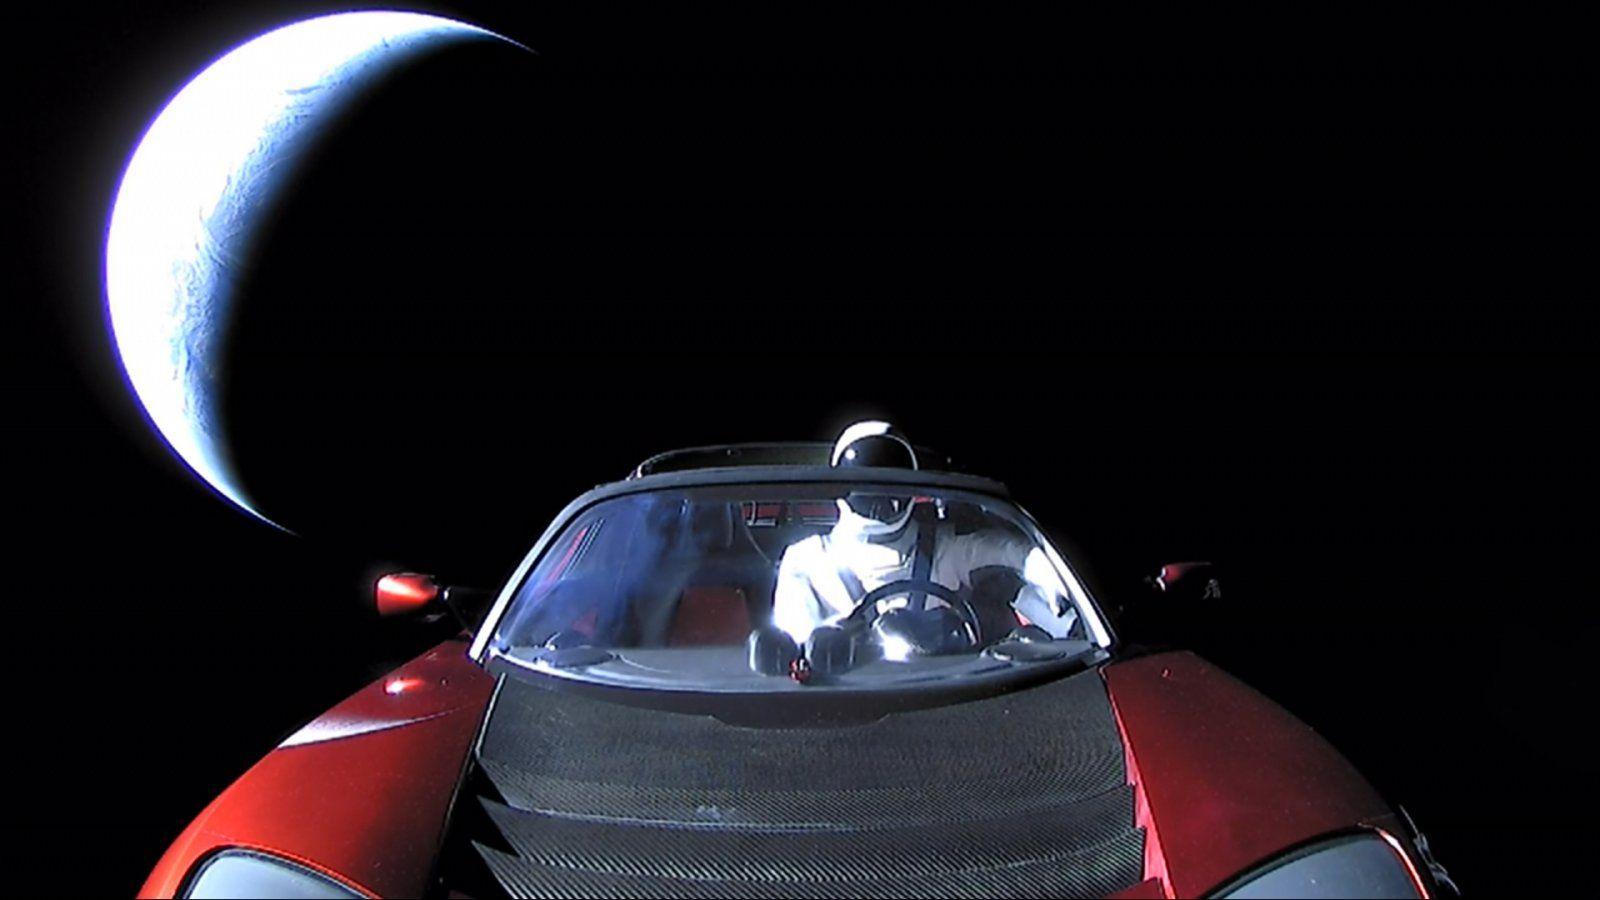 180208-tesla-spacex-earth-se-413p_8dc09d749a030e0af136369eaa9748ae.jpg